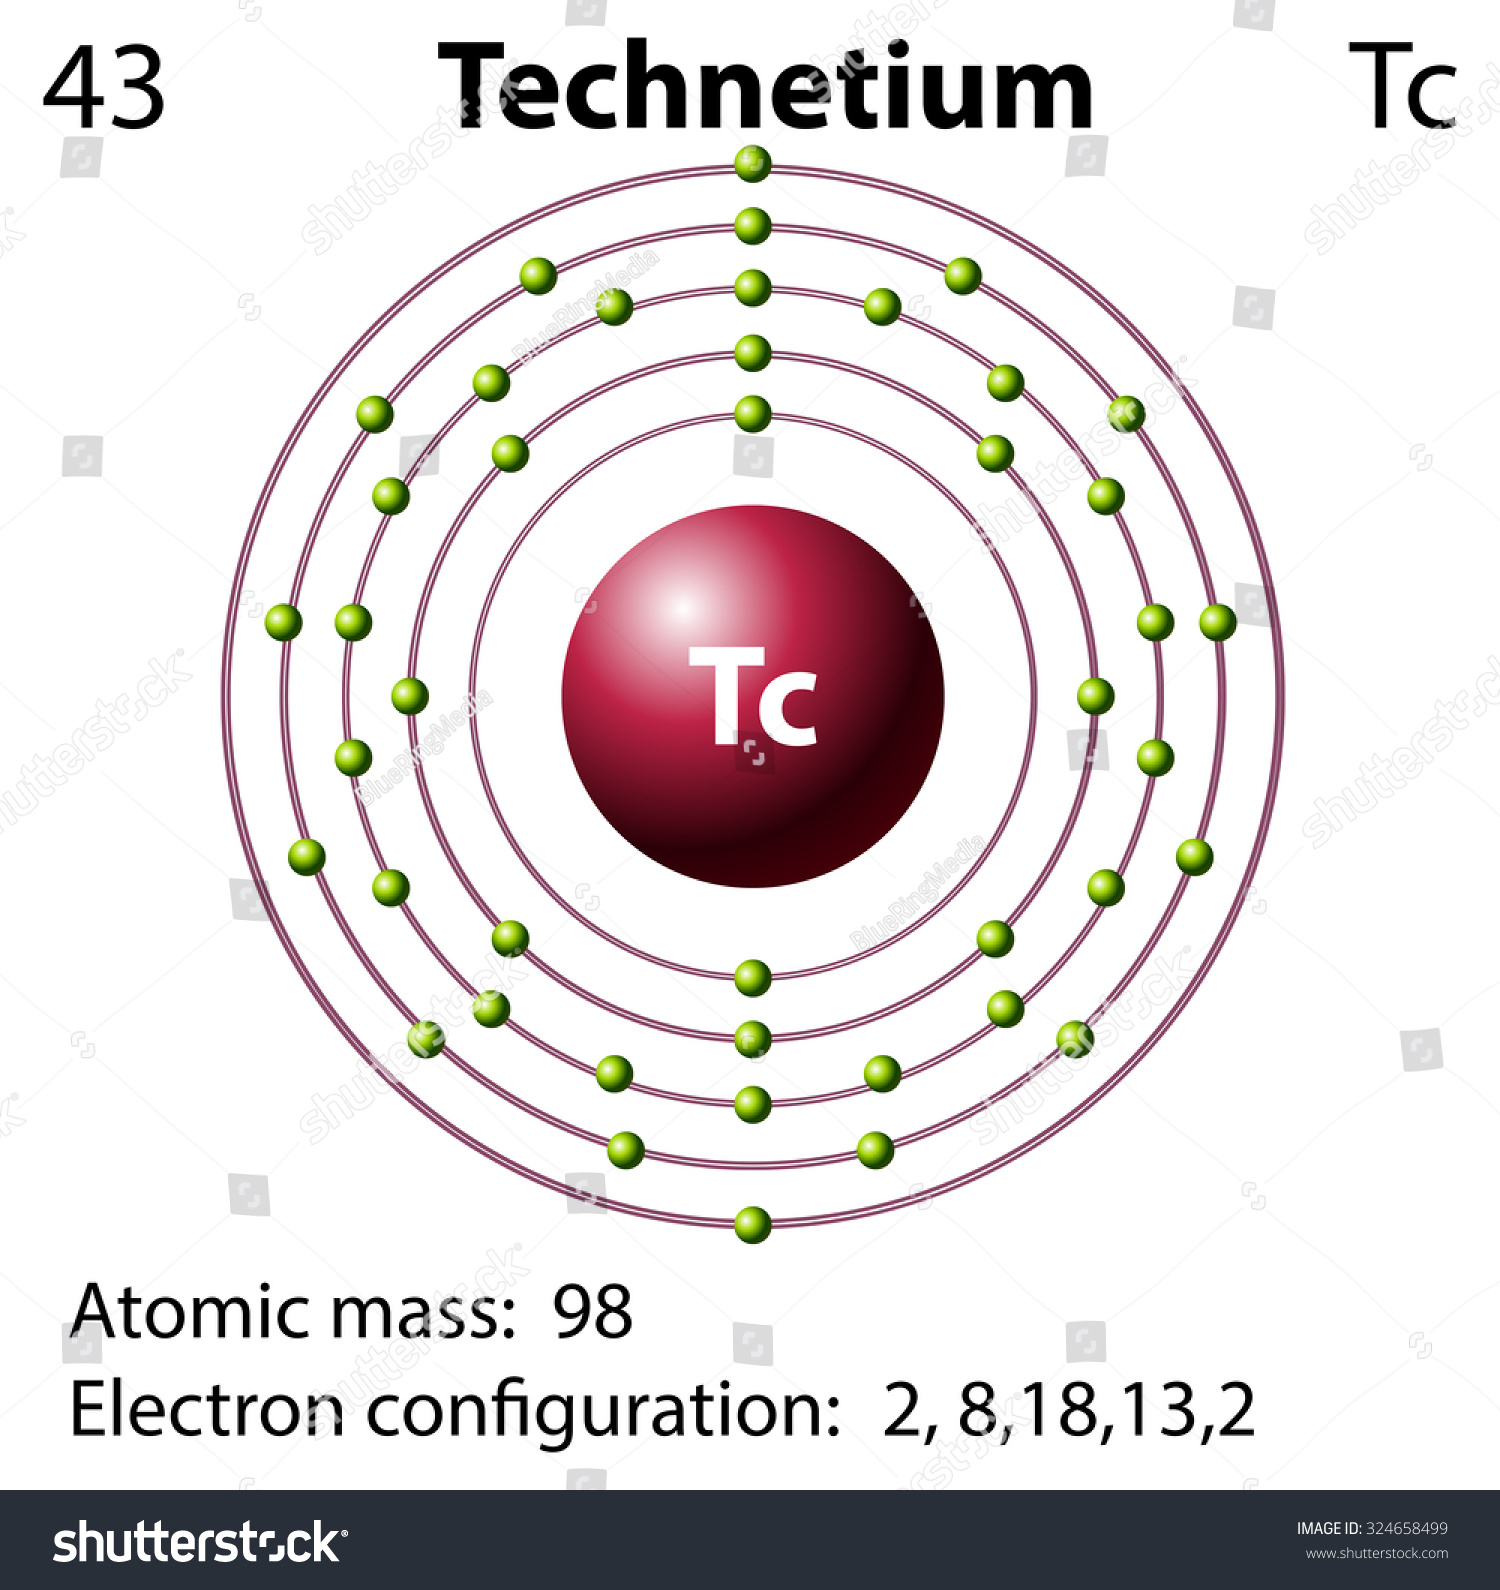 Symbol Electron Diagram Technetium Illustration Stock Vector